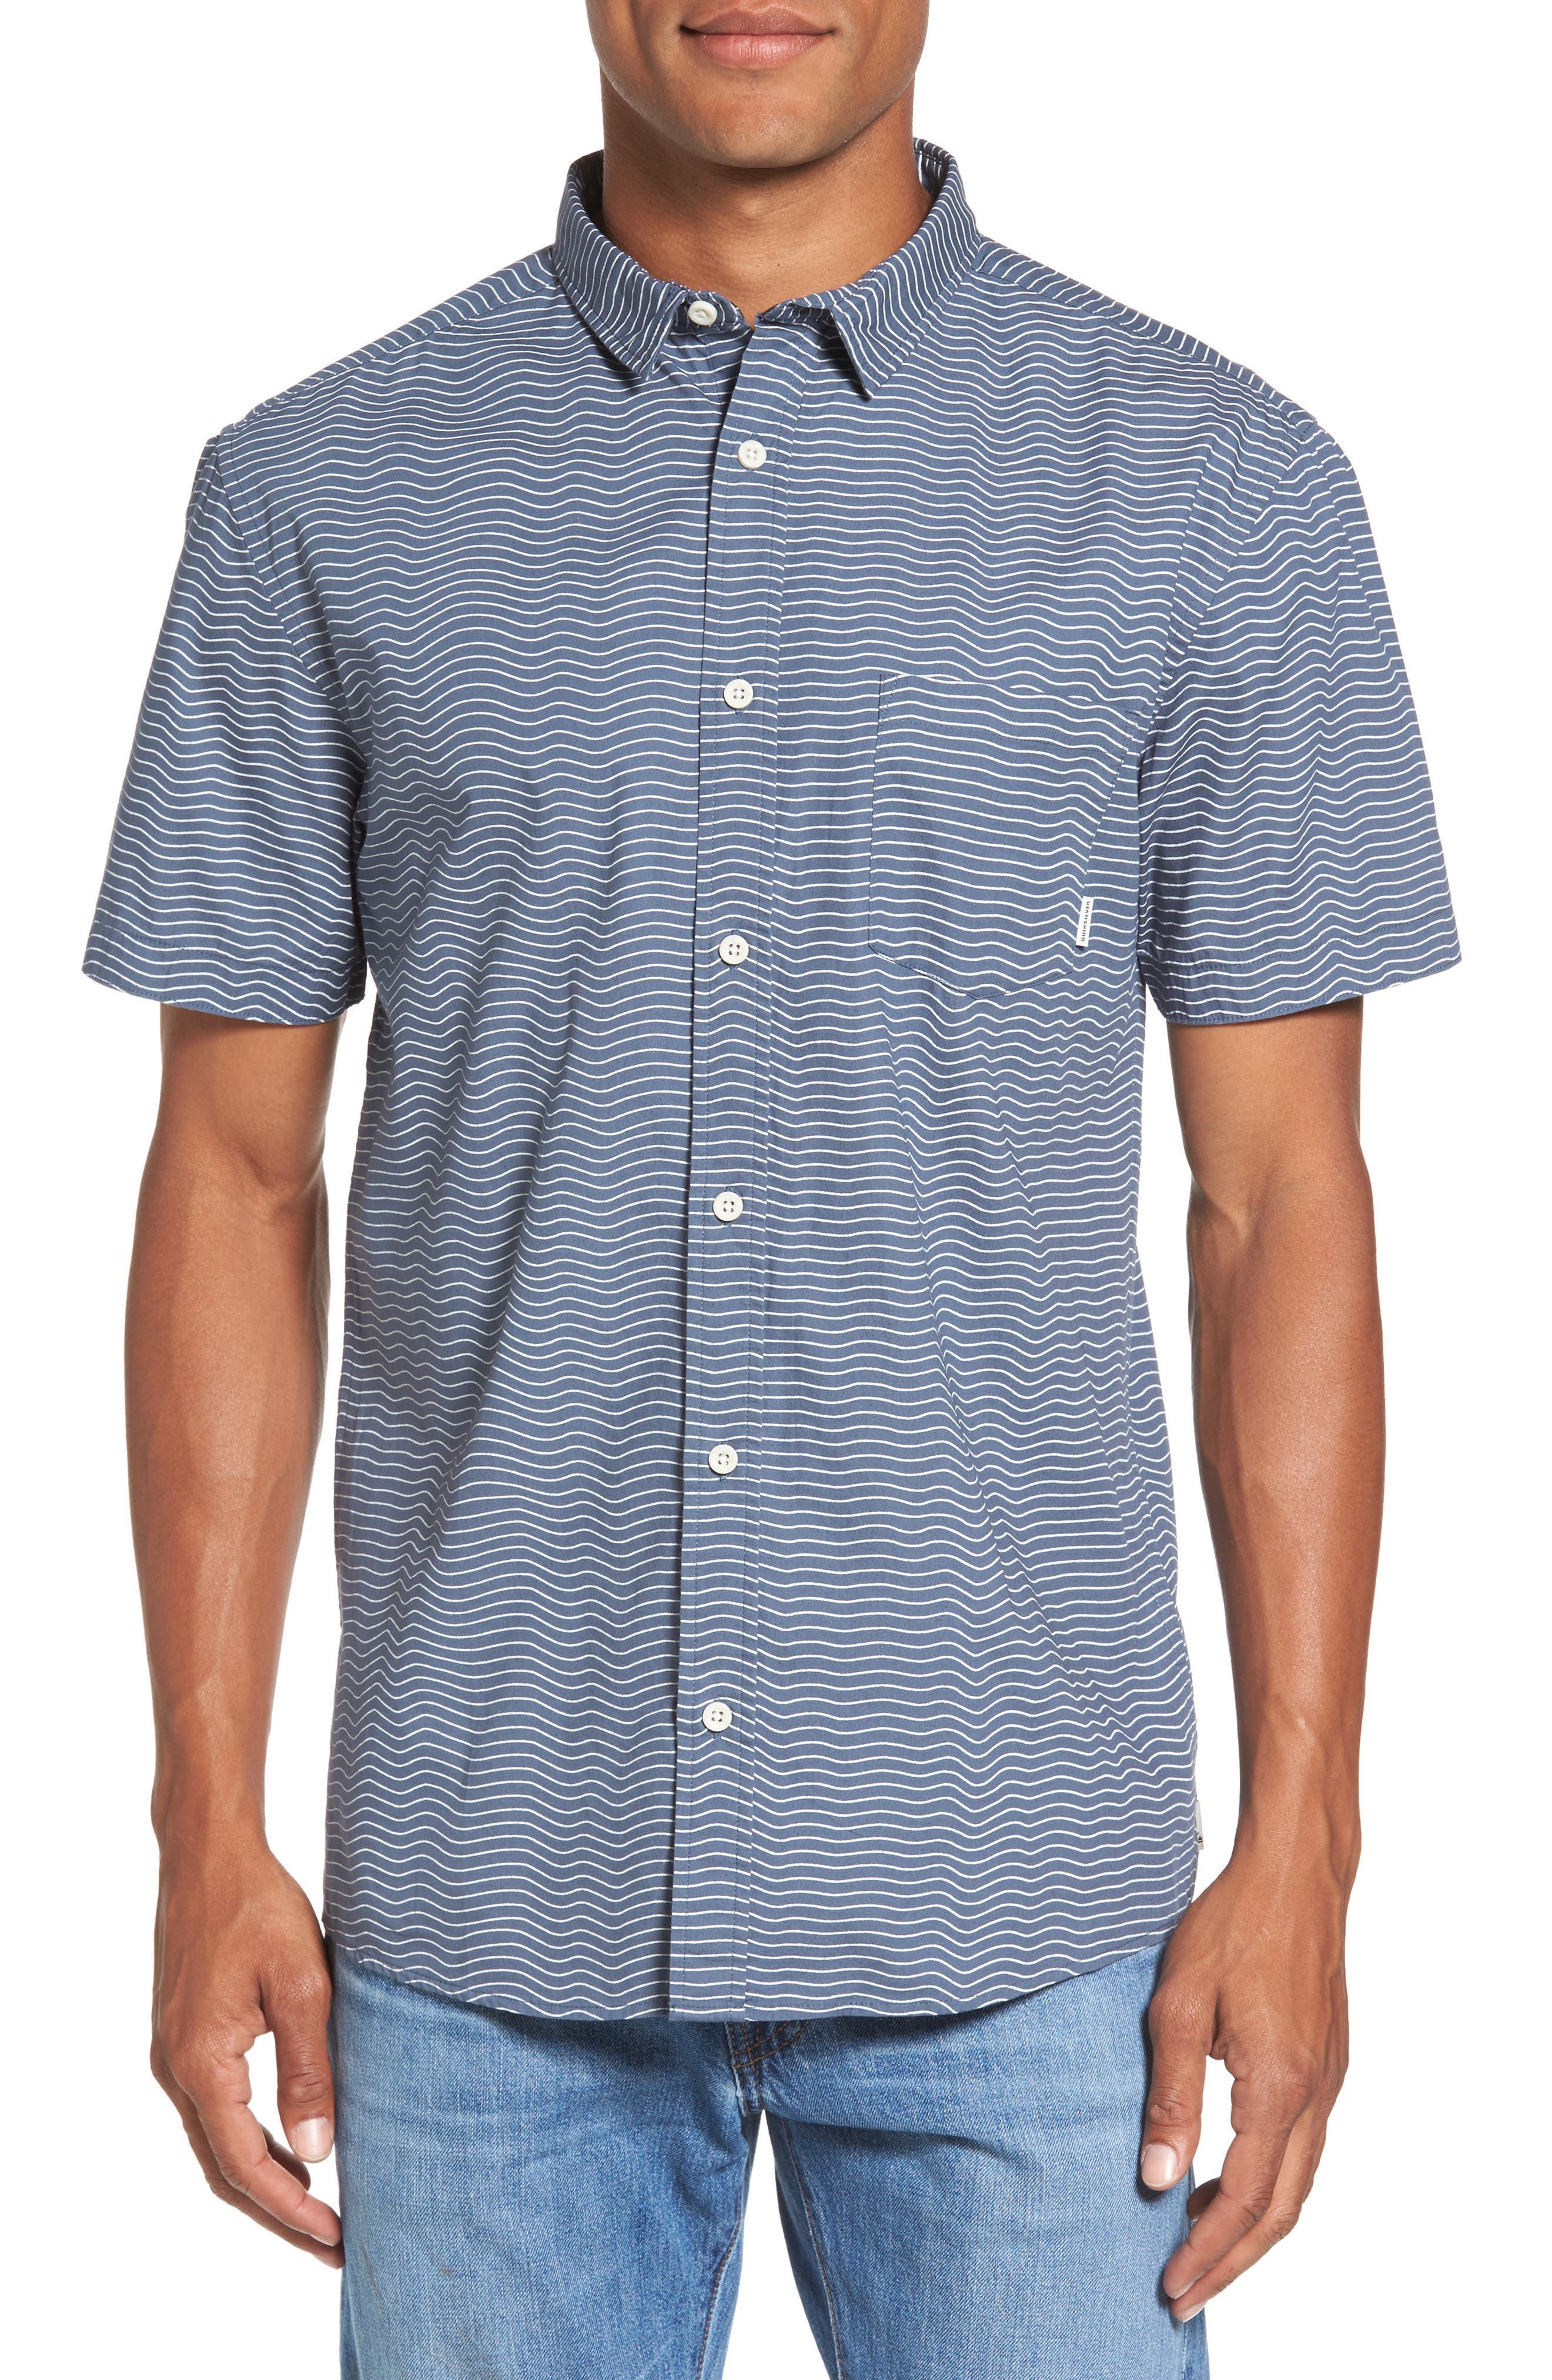 Quiksilver Heat Wave Stripe Shirt